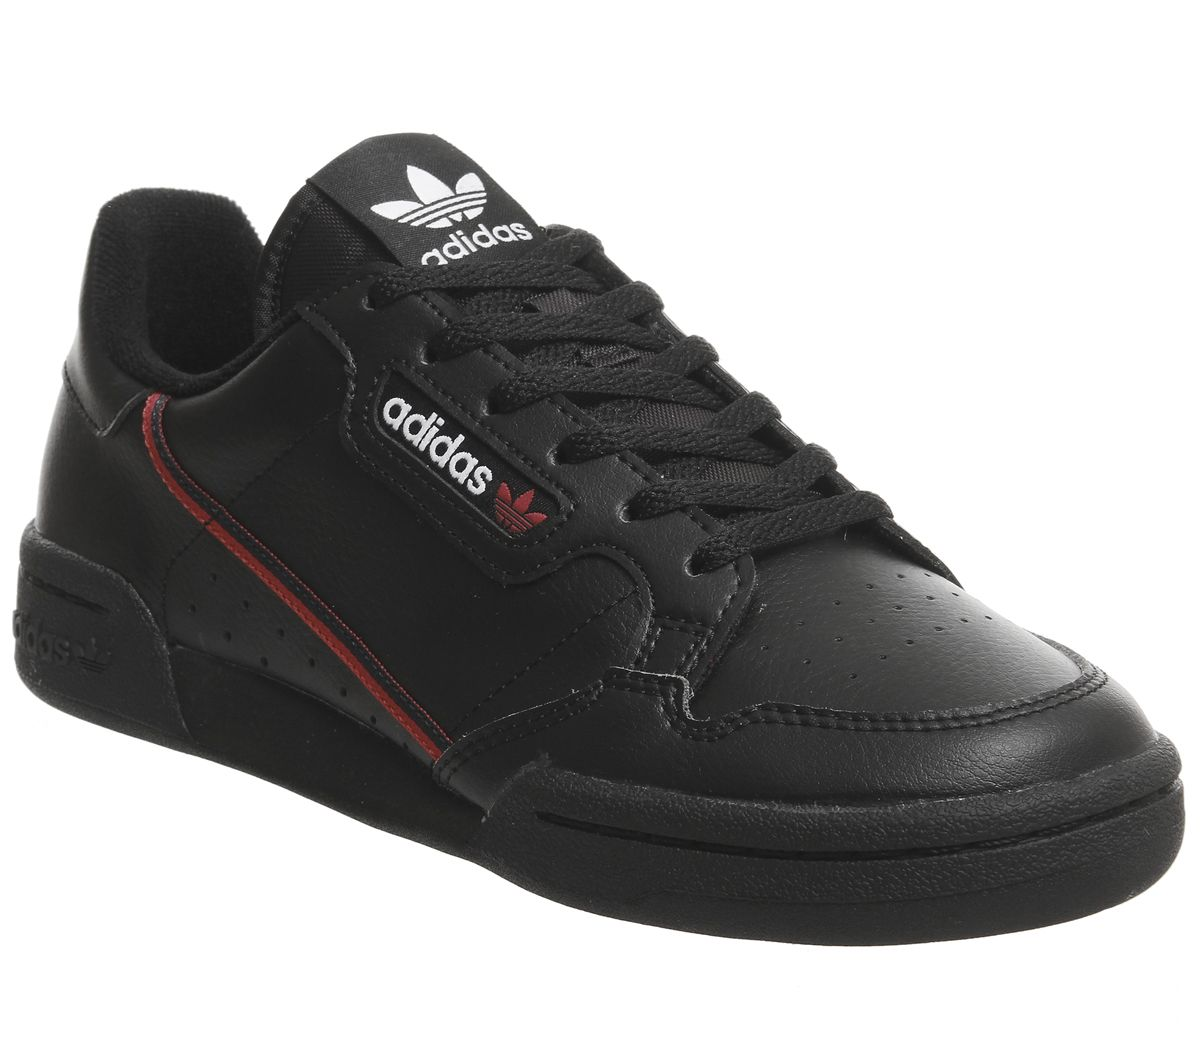 new product 38e2c e8bf1 adidas Continental 80s Junior Trainers Core Black Scarlet ...